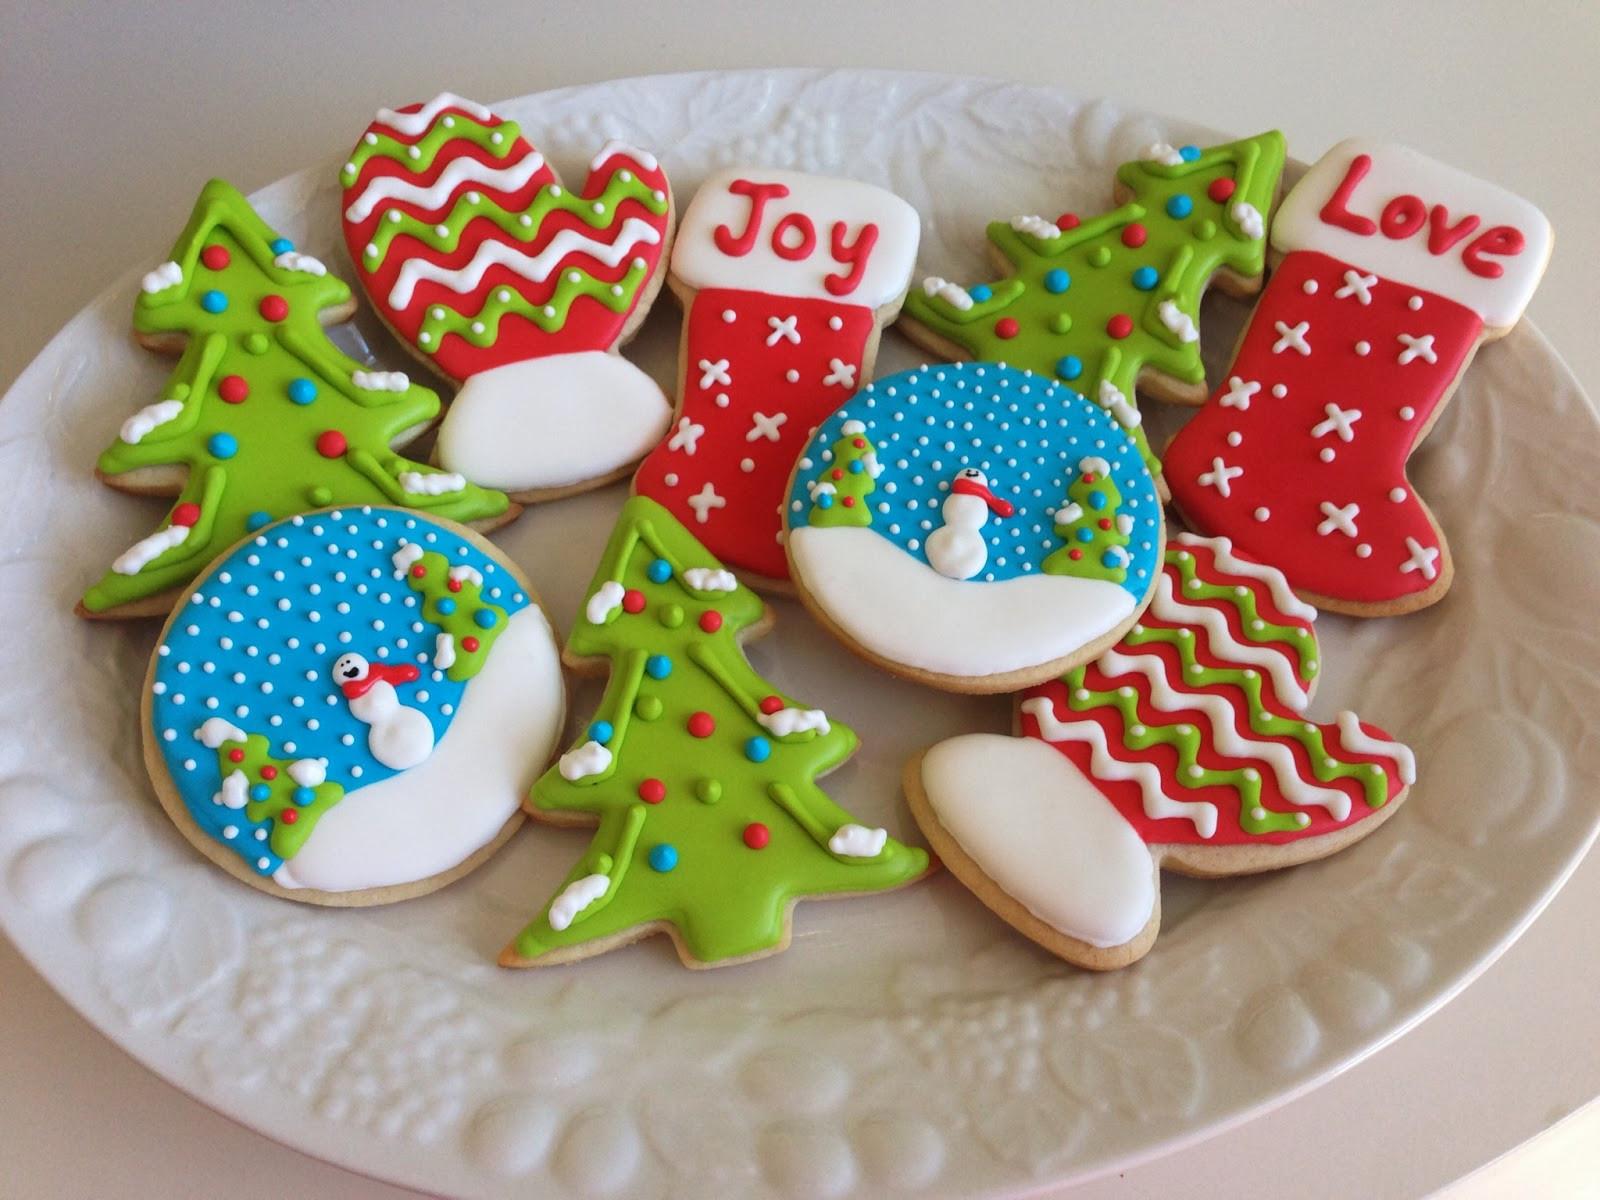 Royal Icing Recipe For Sugar Cookies  Royal Icing For Sugar Cookies Recipe — Dishmaps